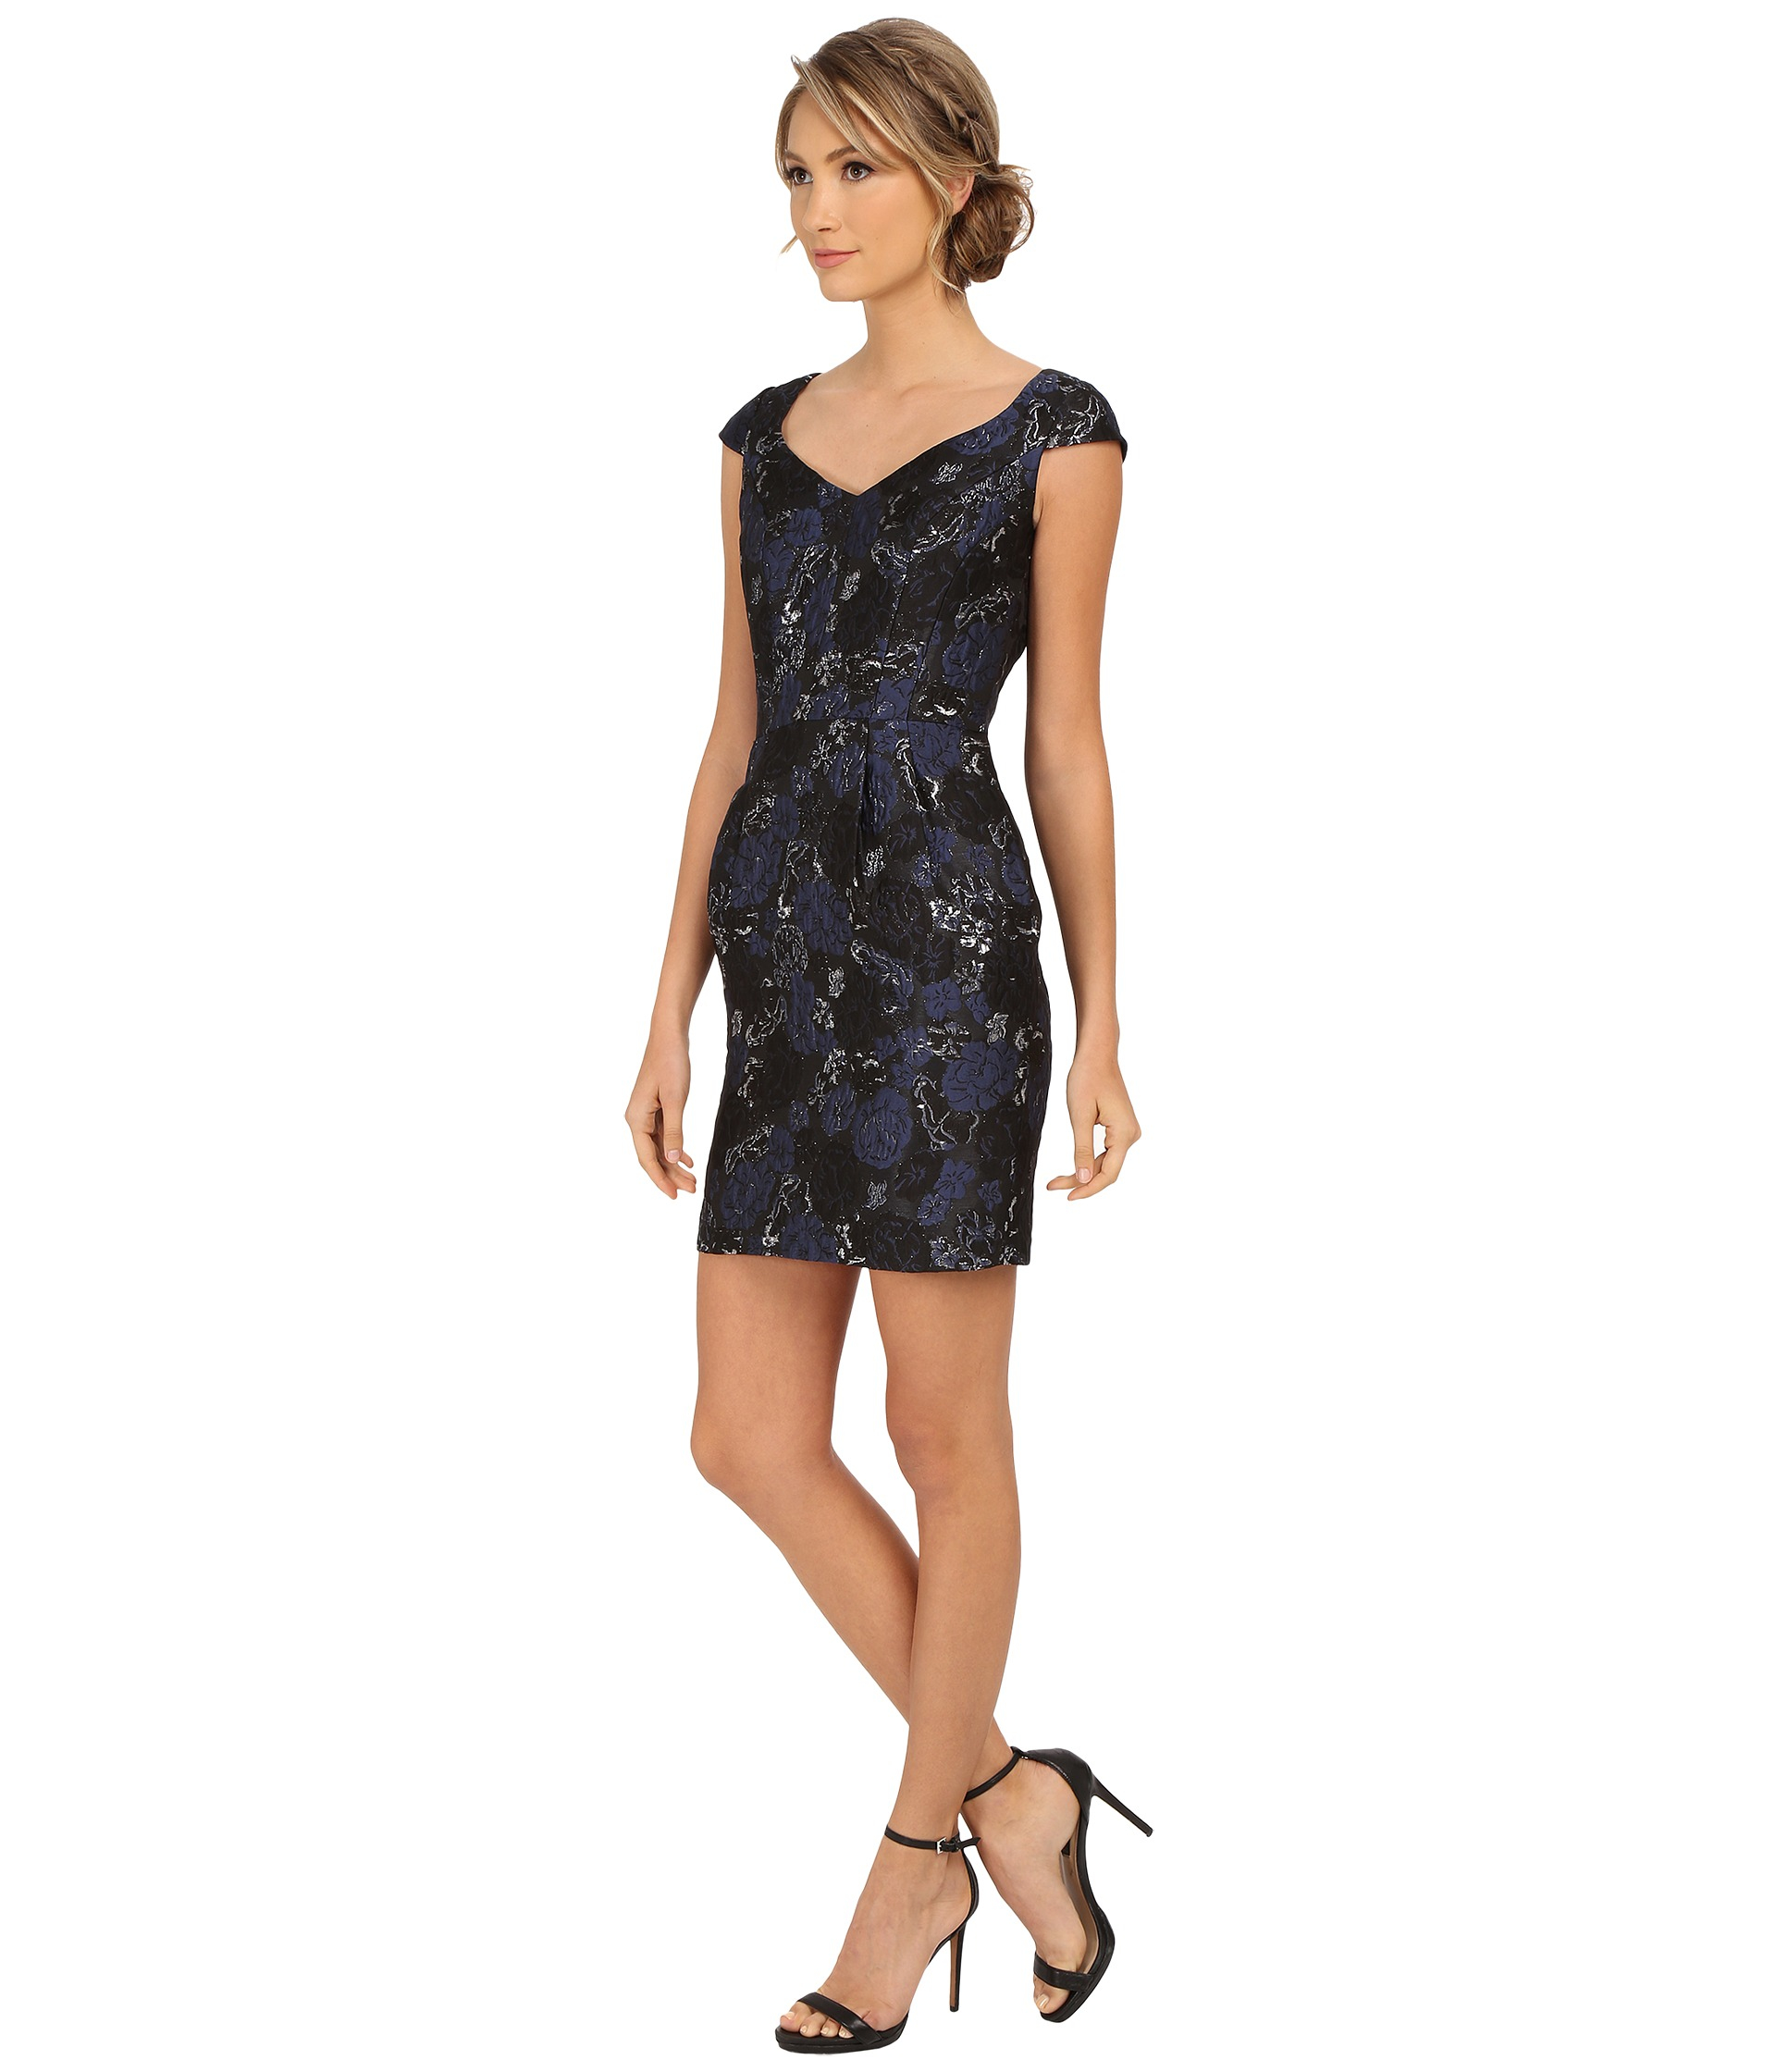 Lyst - Aidan Mattox Cap Sleeve Foil Jacquard Cocktail Dress